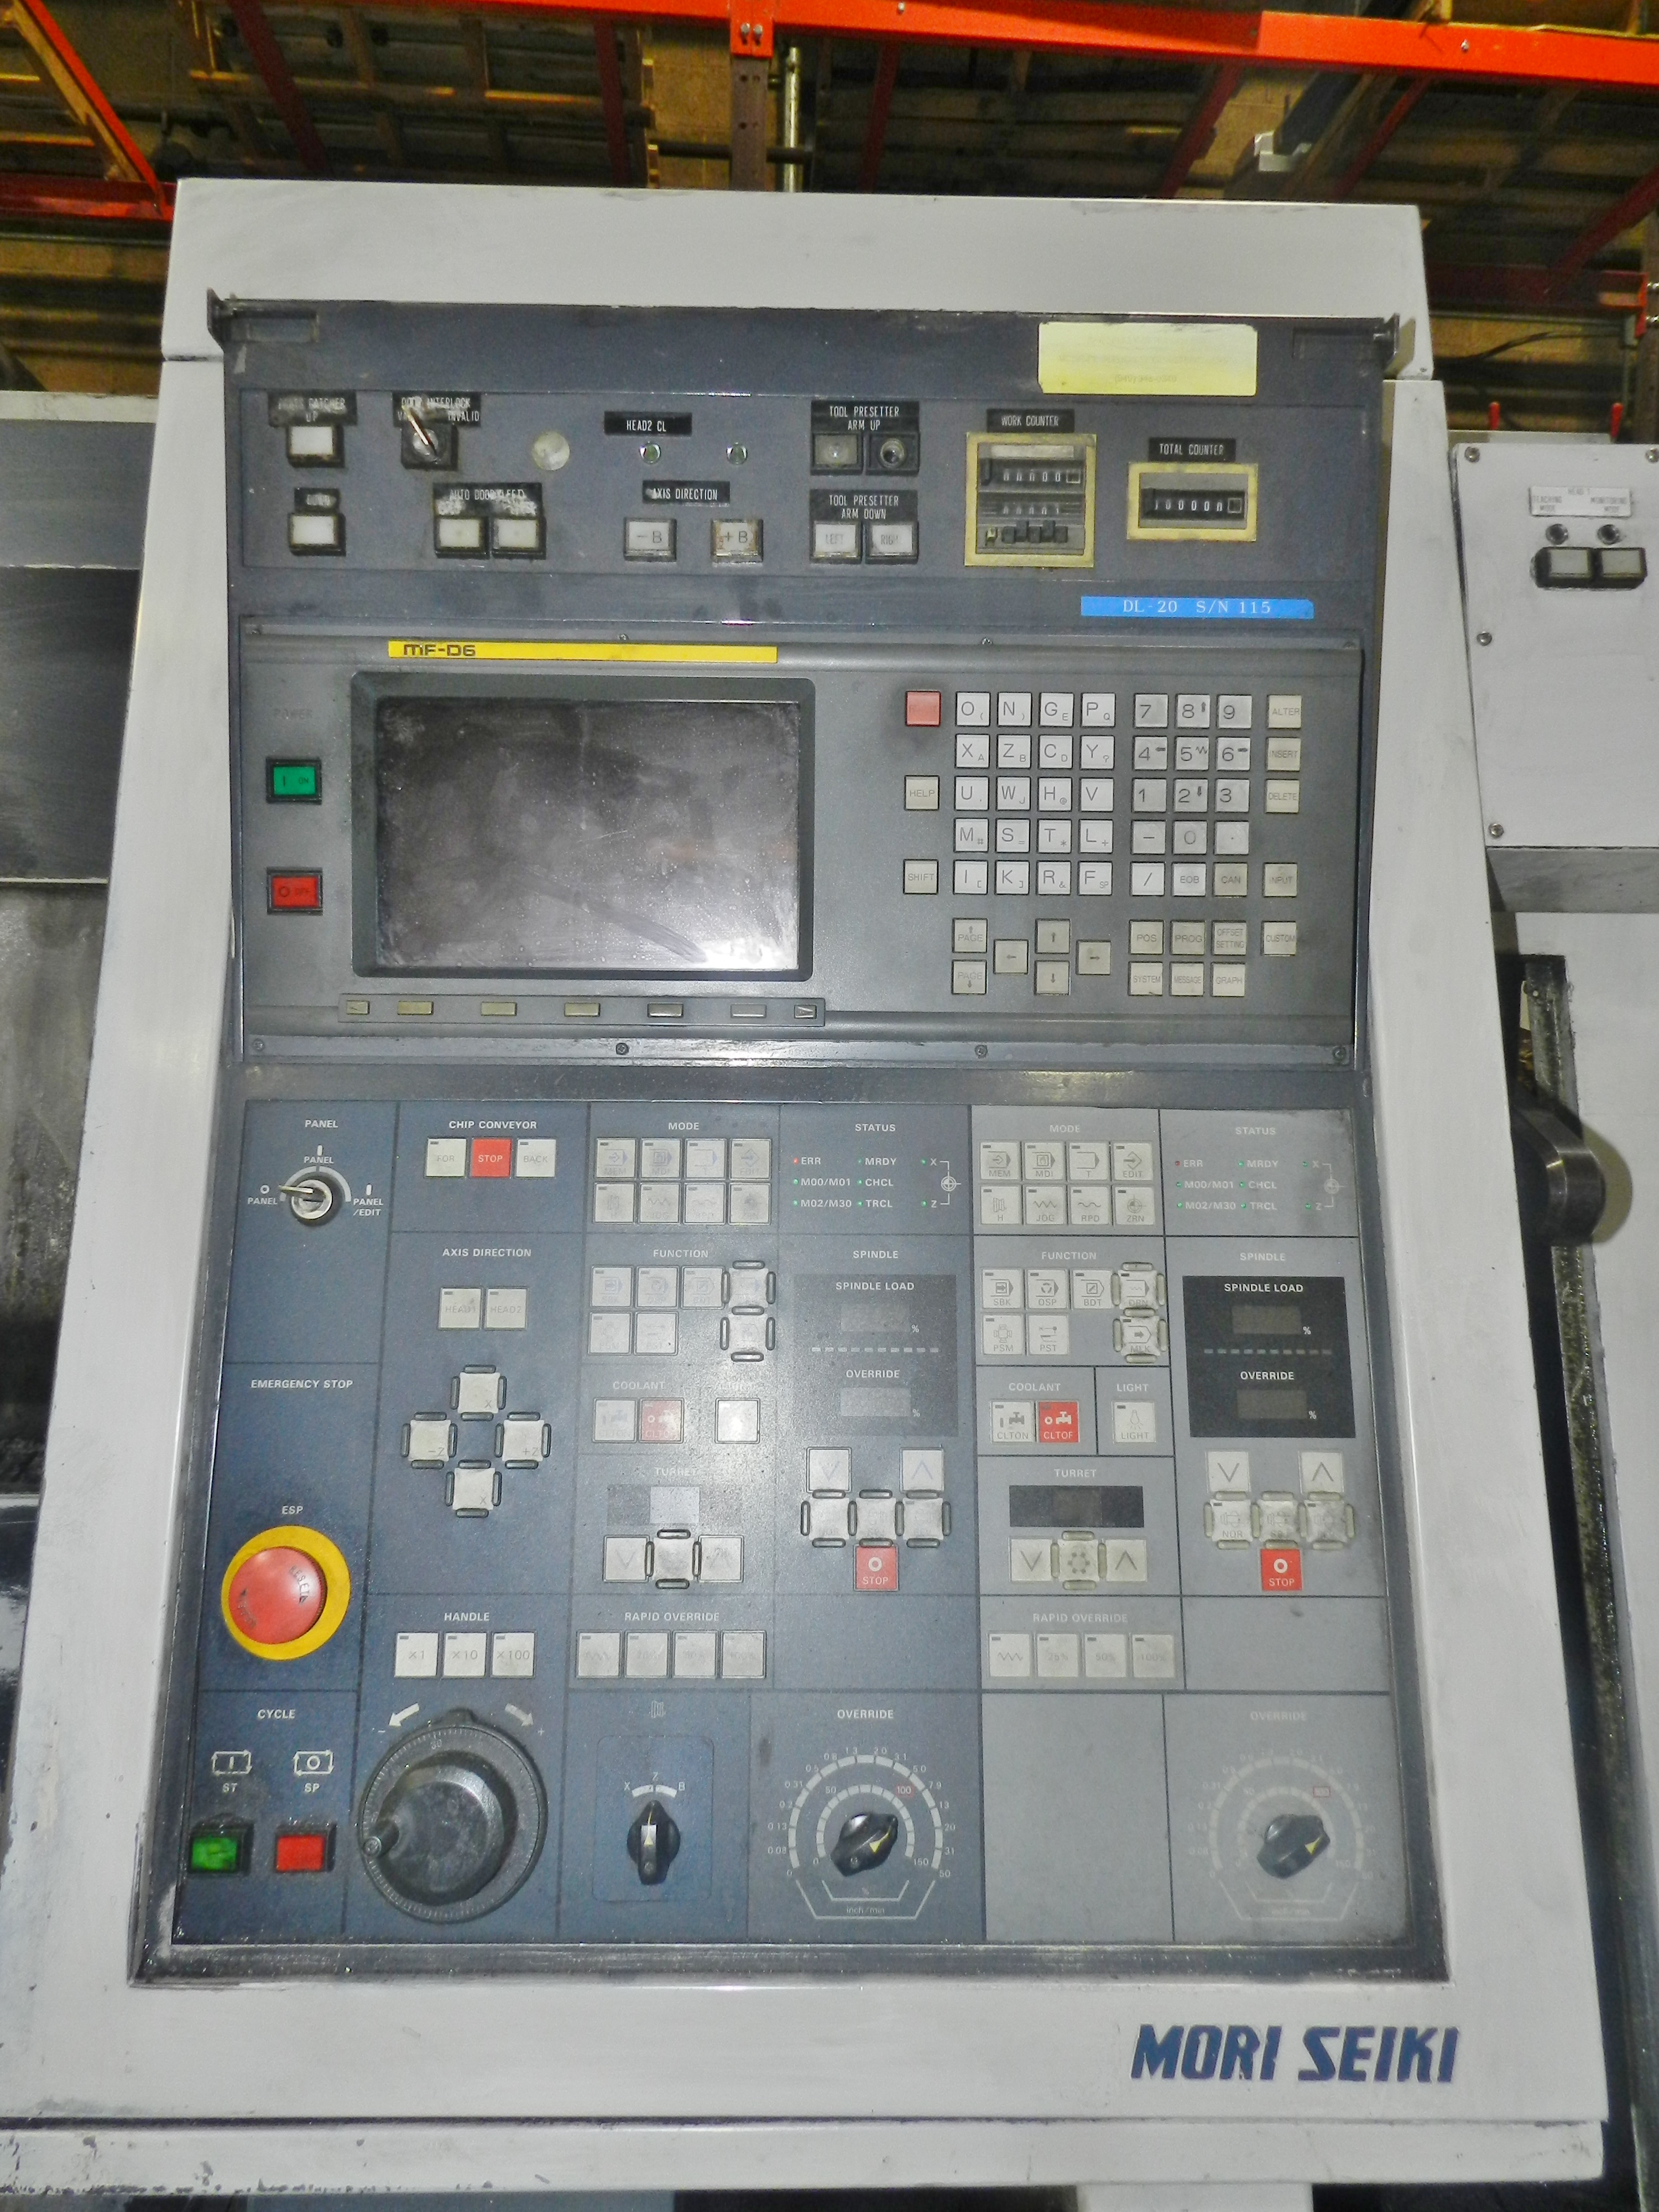 Mori Seiki DL-20 CNC Lathe - Image 8 of 12